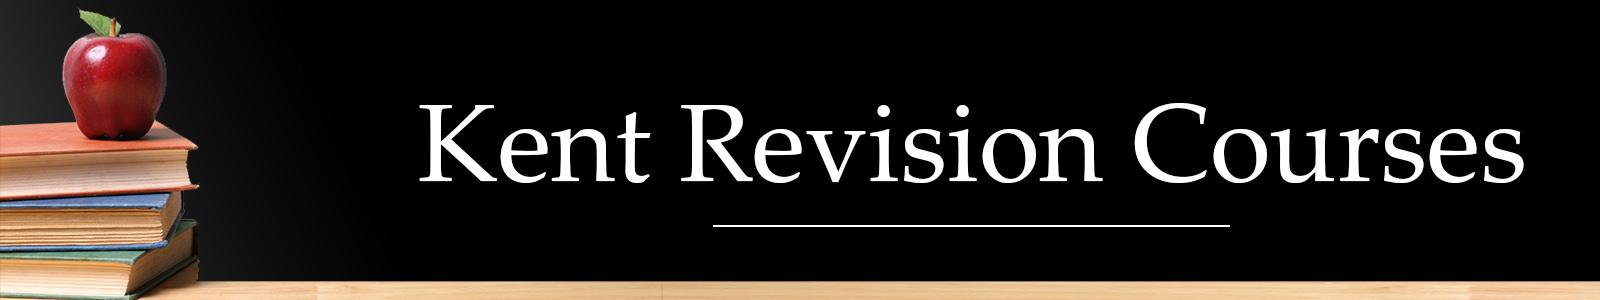 kent revision, courses, study, a level